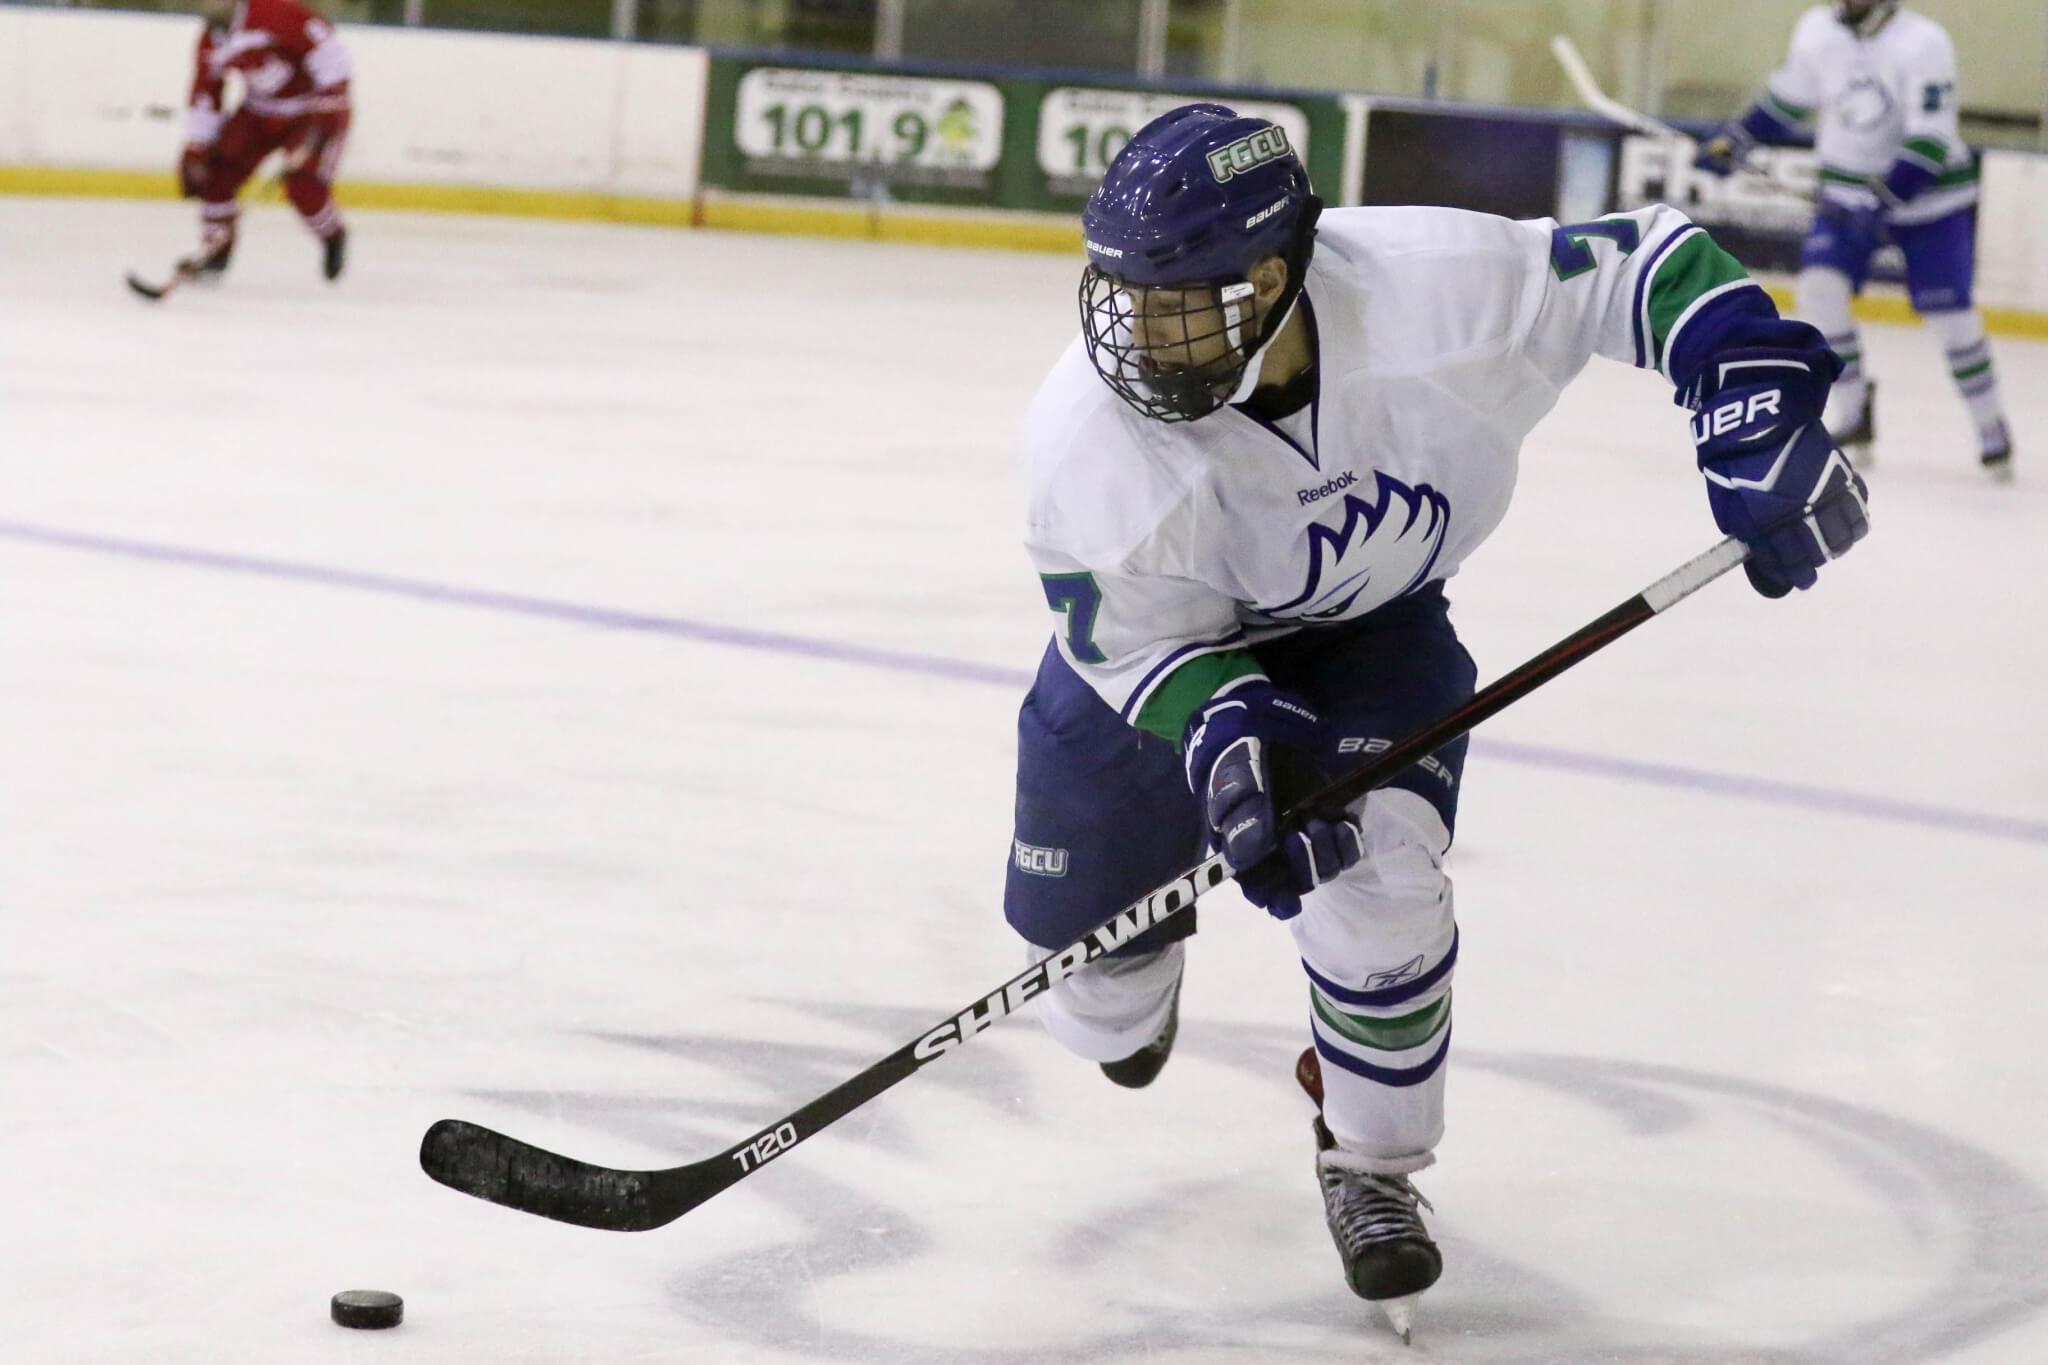 FGCU DII hockey ranked No. 1 in first ACHA poll